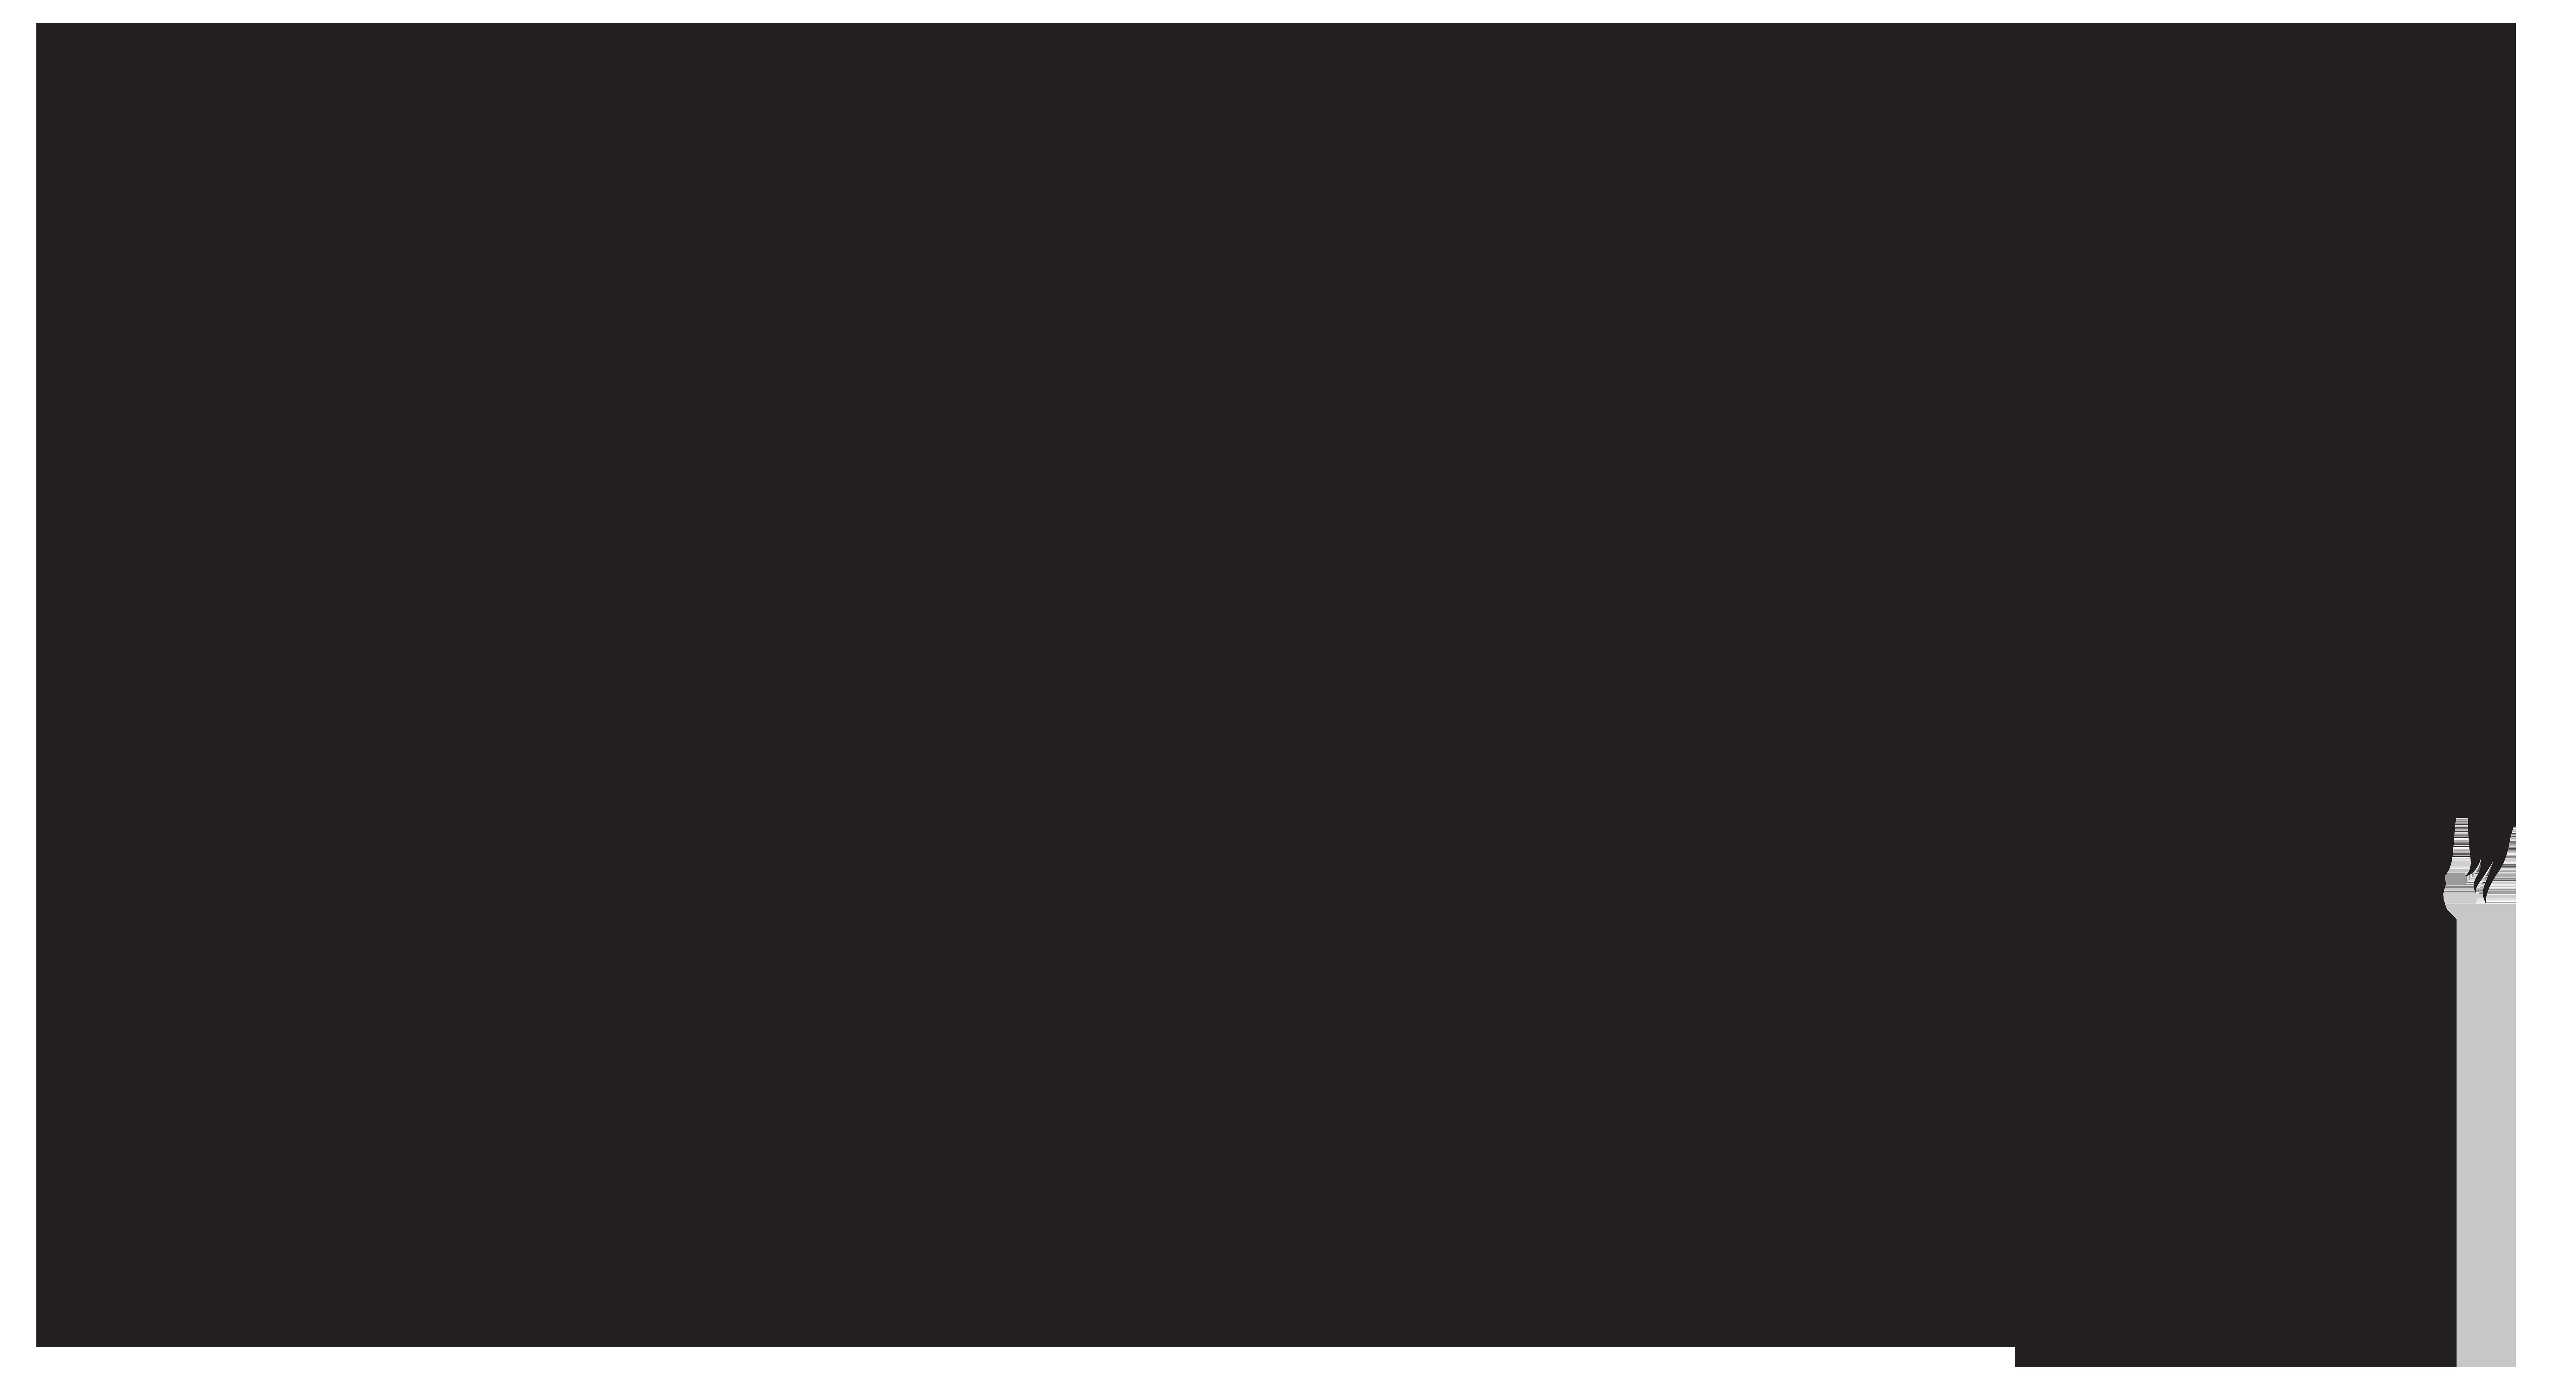 Rhino Clipart - ClipArt Best